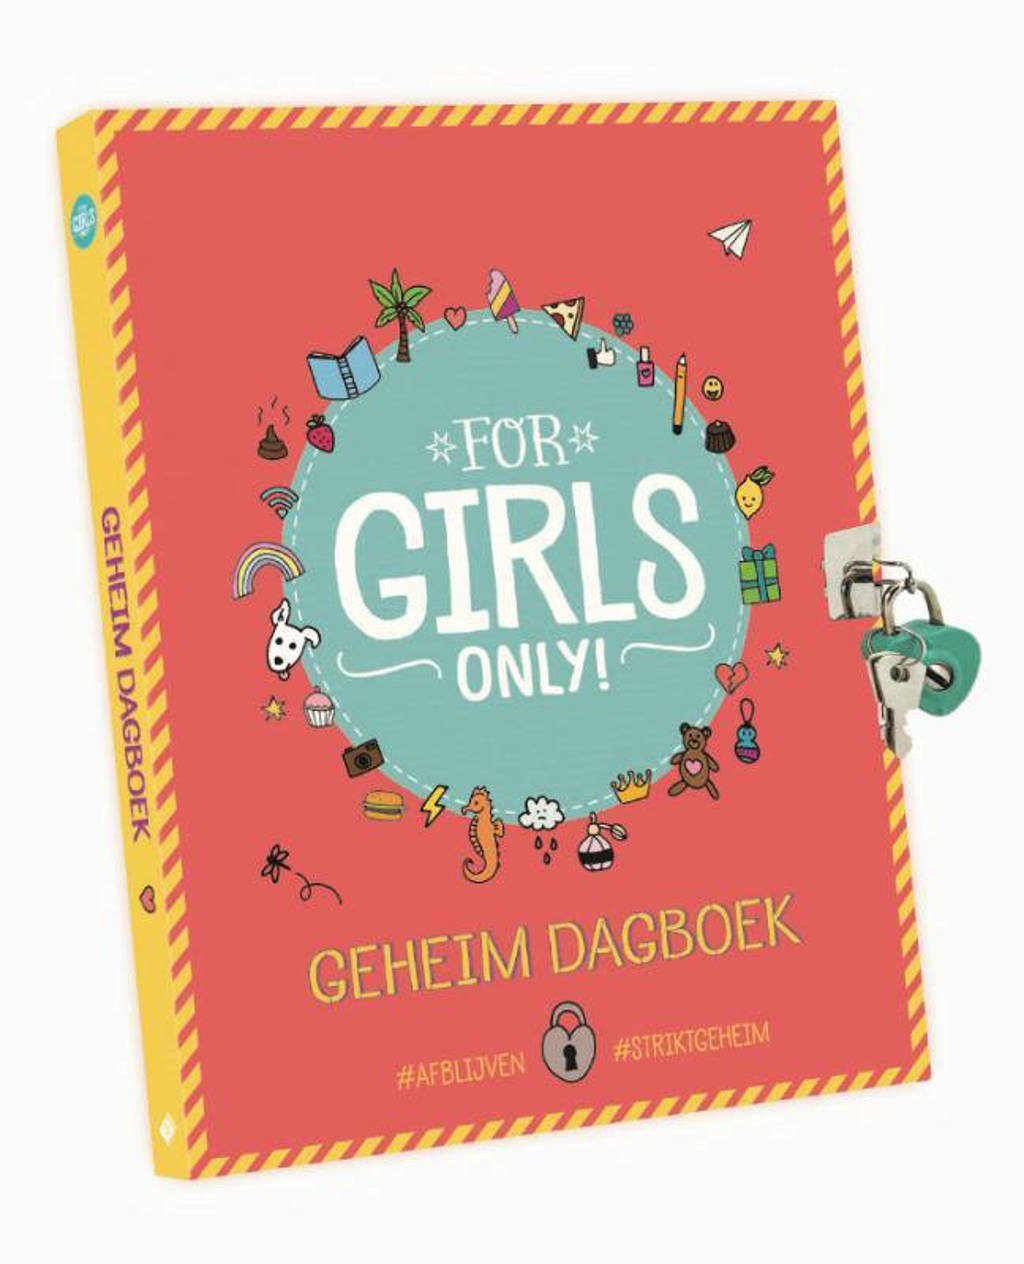 For Girls Only!: Geheim dagboek - Ruthje Goethals